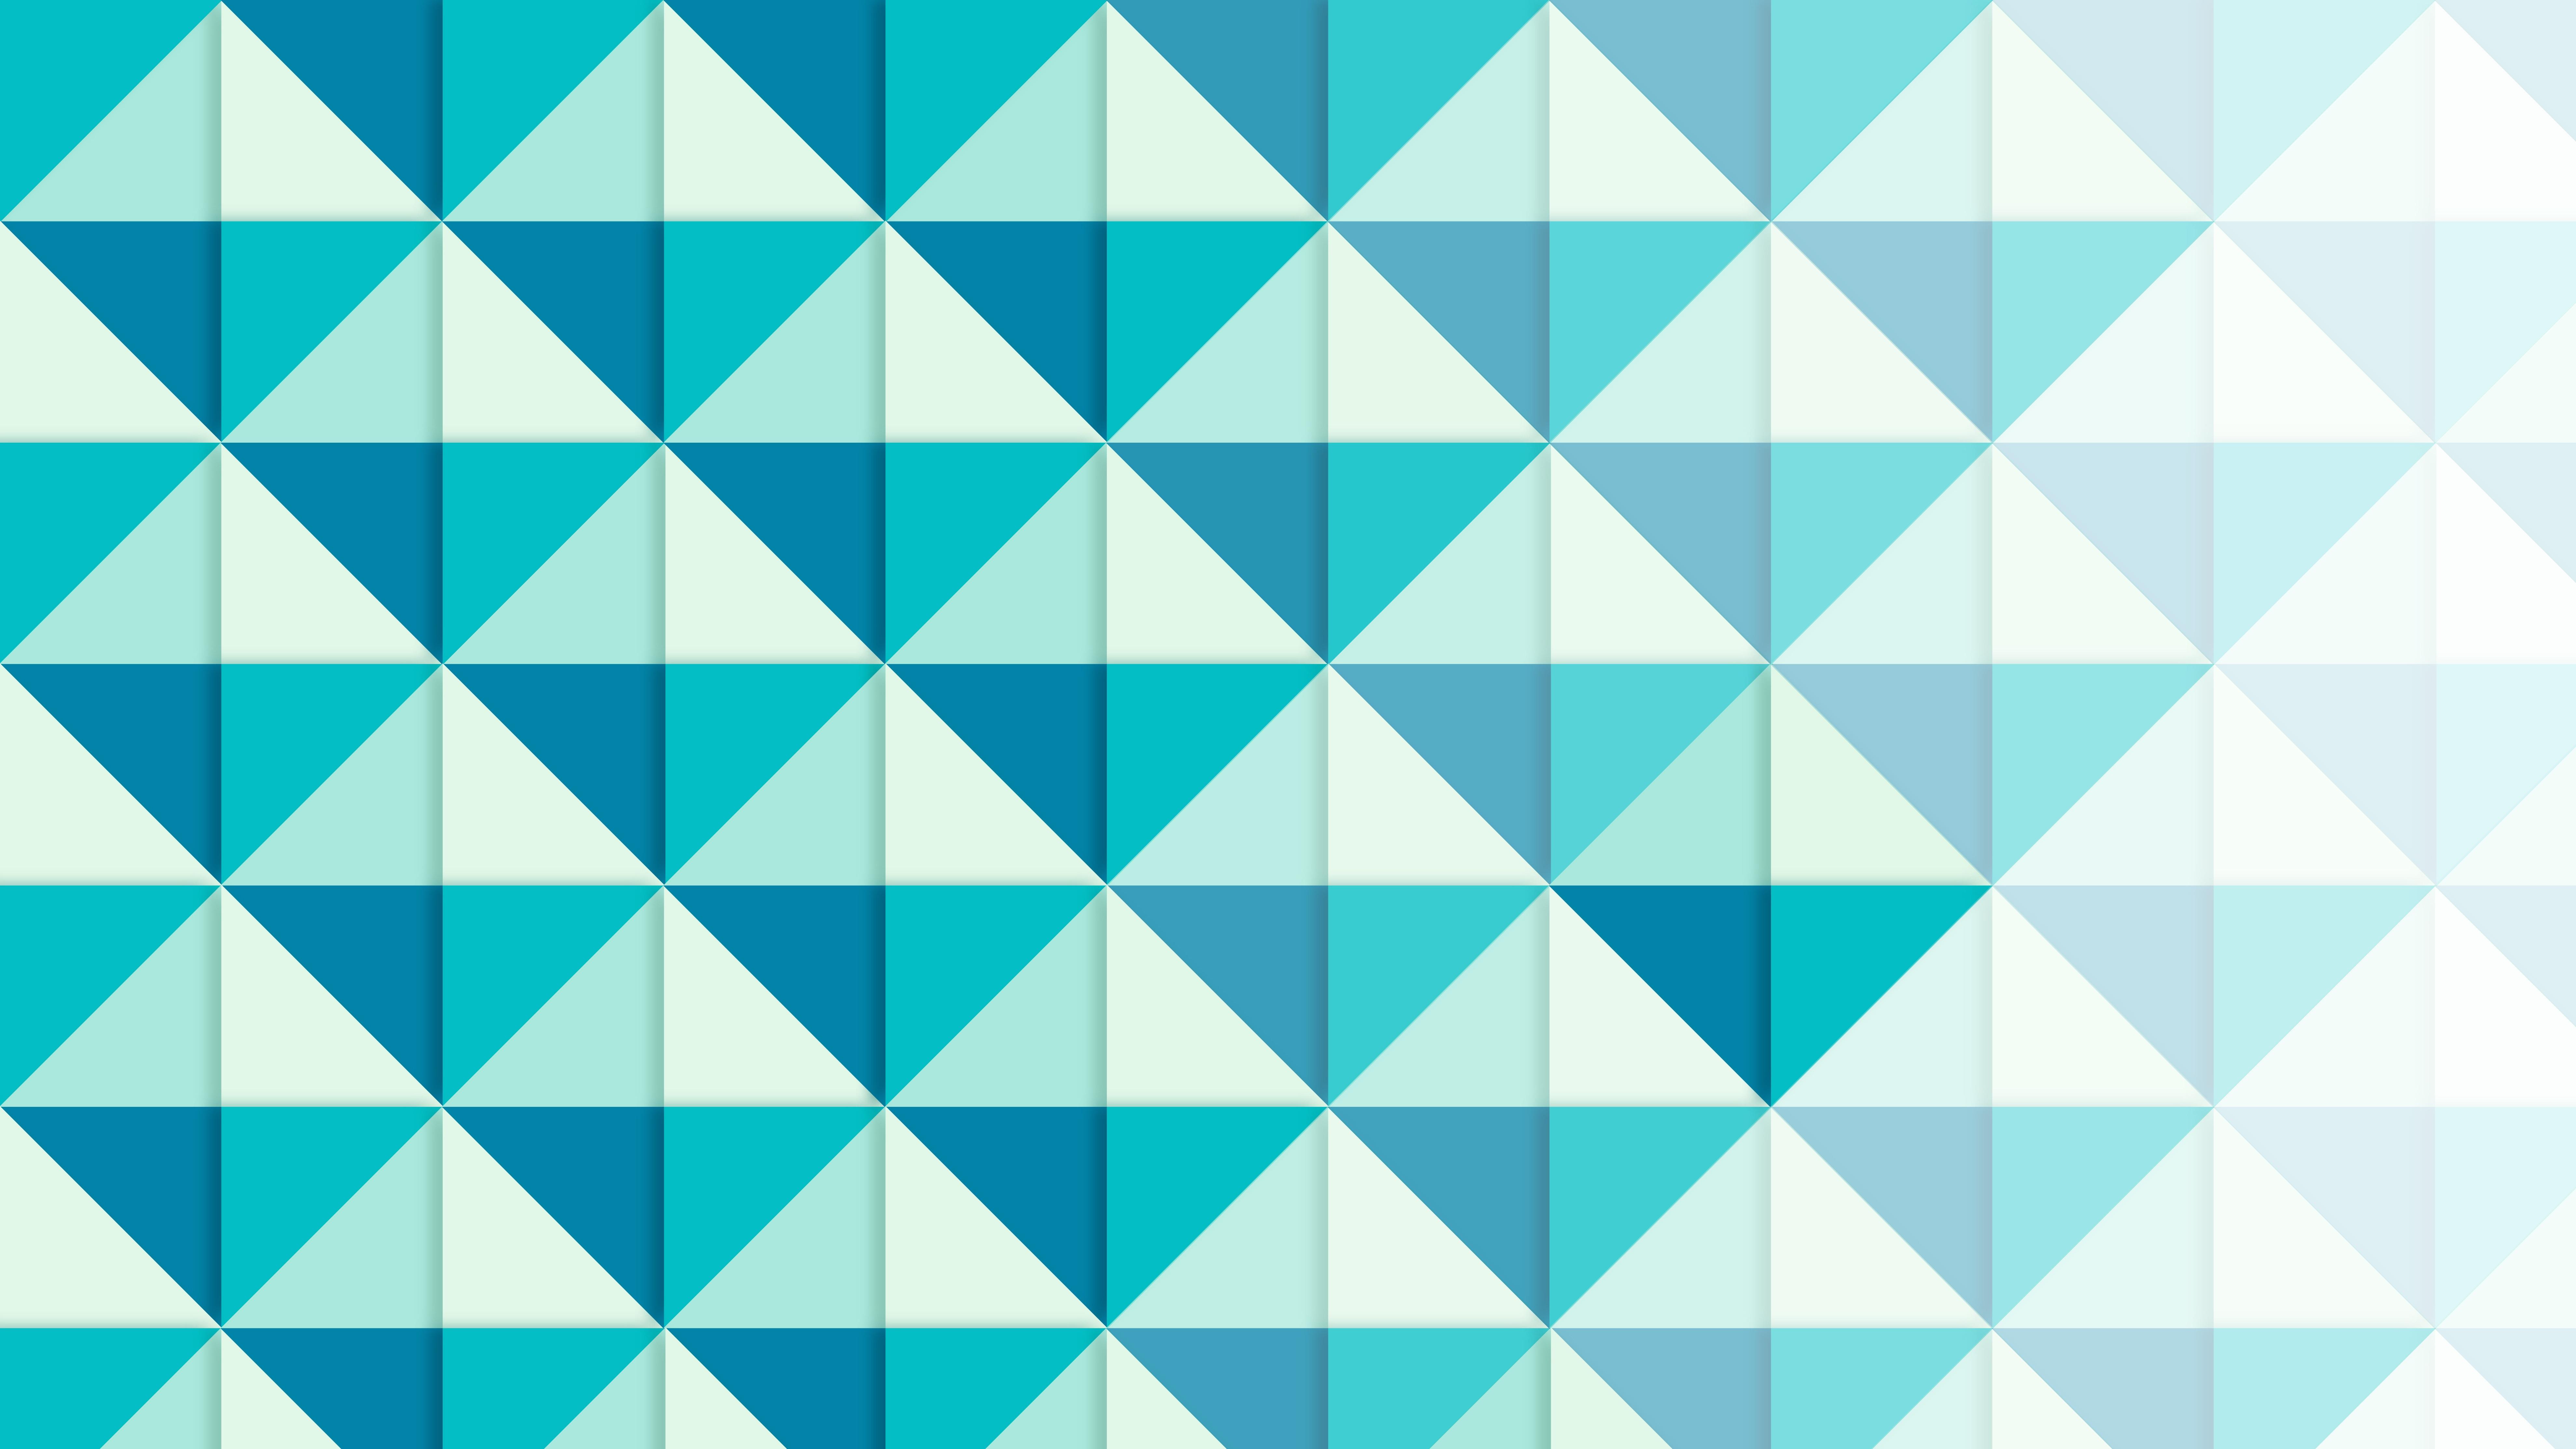 Fondo Geométrico: Background Geometric Design Backdrop Texture, HD Abstract